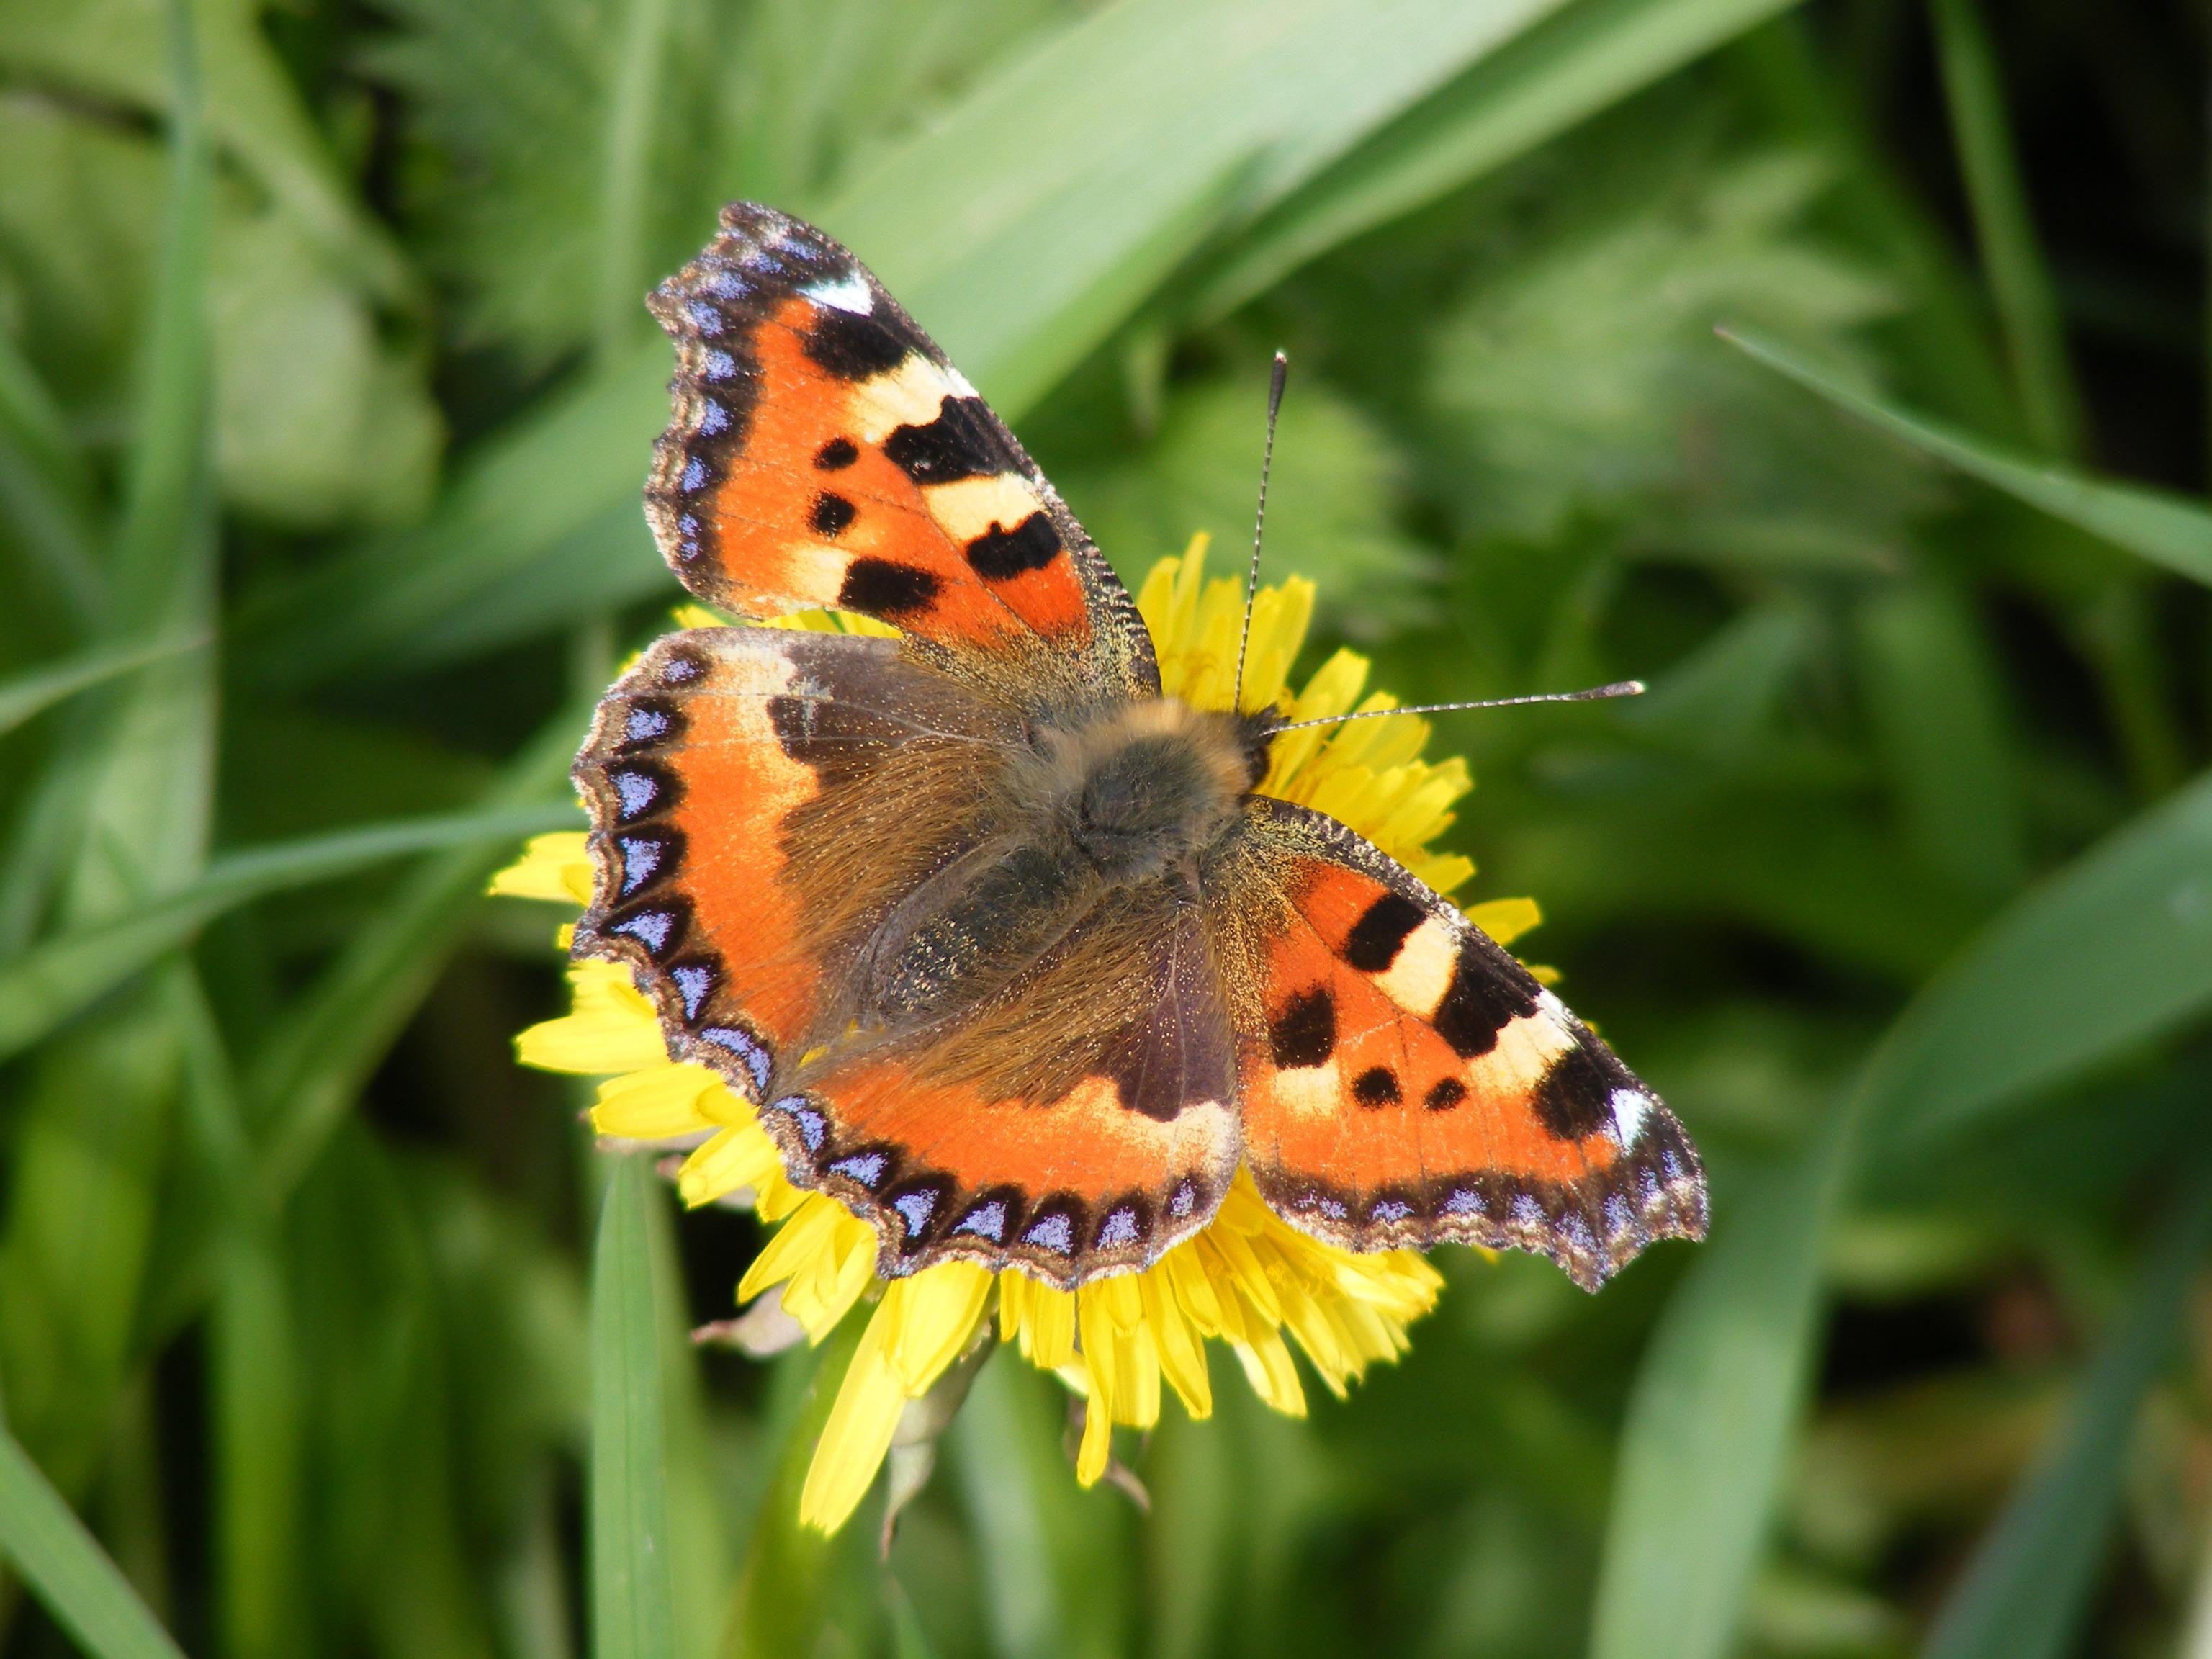 small-tortoiseshell-butterfly-aglais-urticae-12-4-14_04d